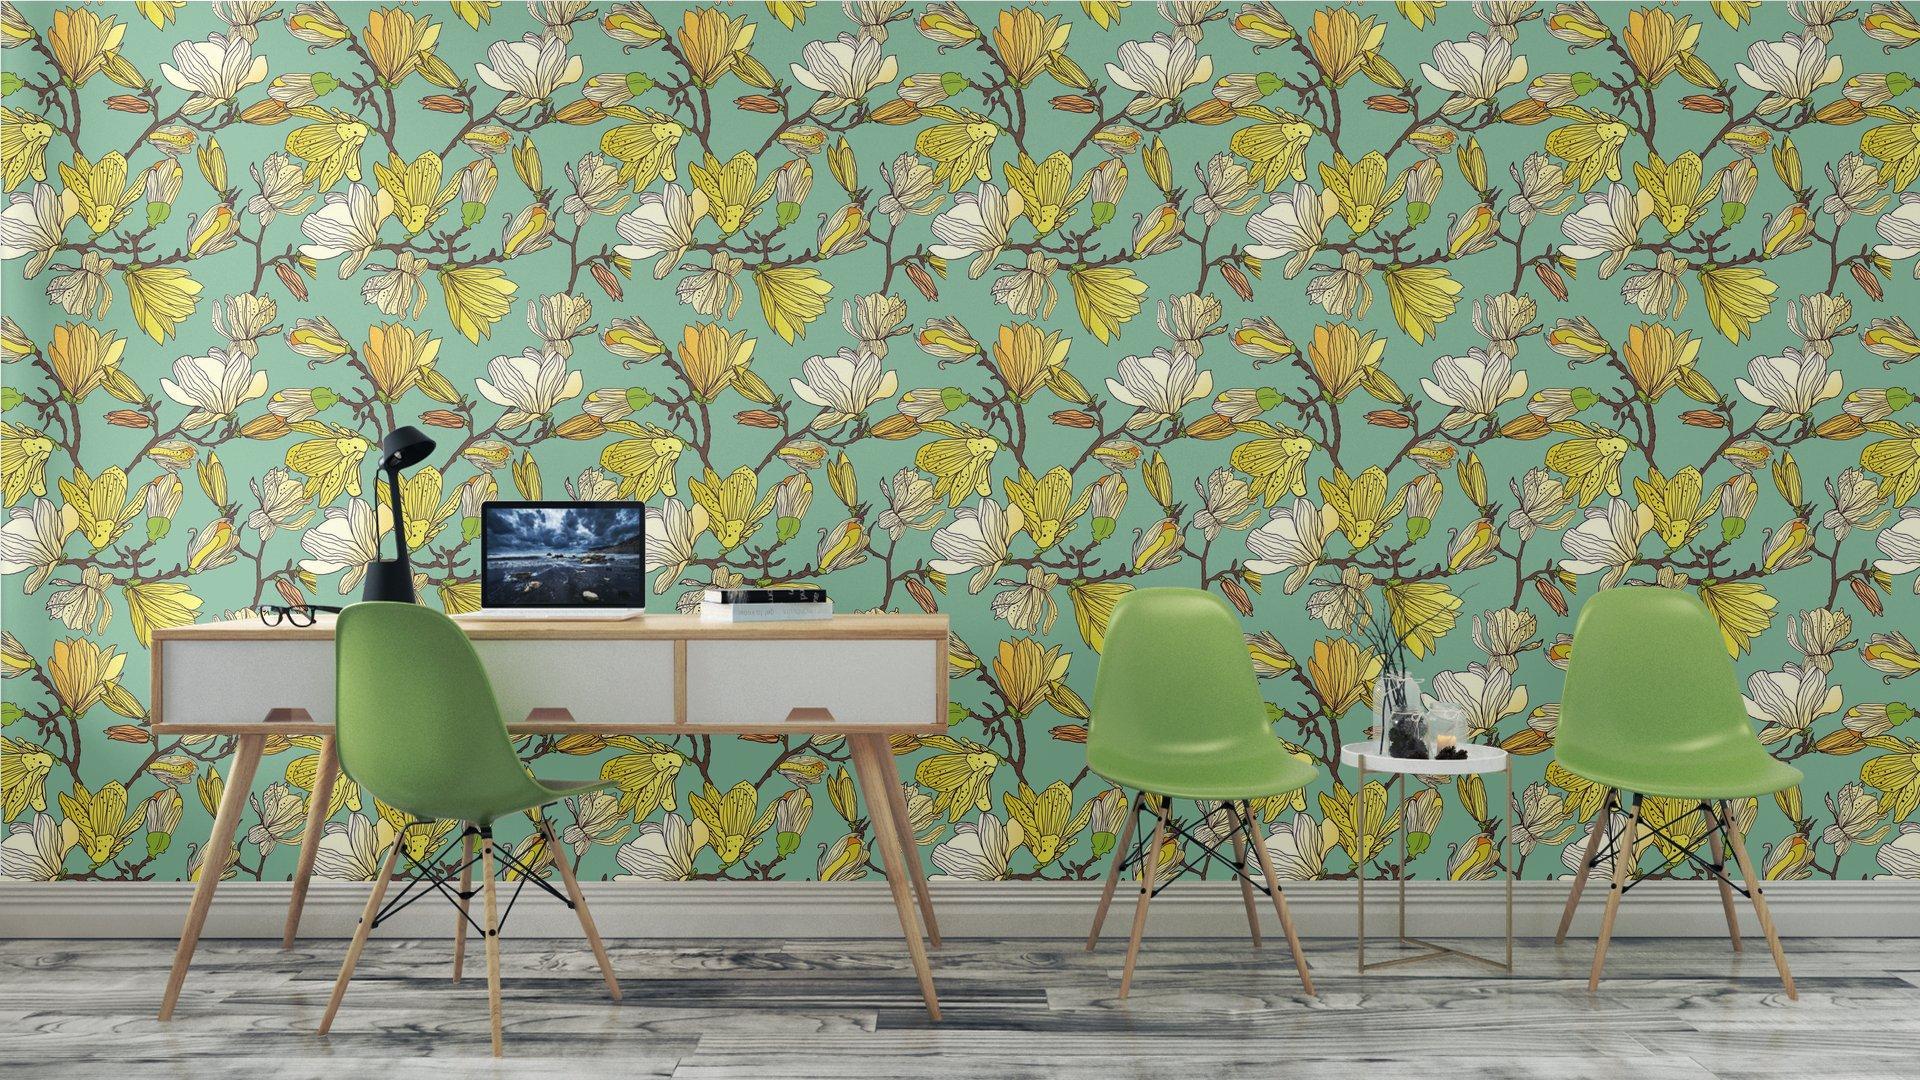 Fotomurales mexico papeles pintados textura floral sin fisuras 8 - Papel Tapiz Patrón Floral en Fondo Azul Tipo Vintage 01